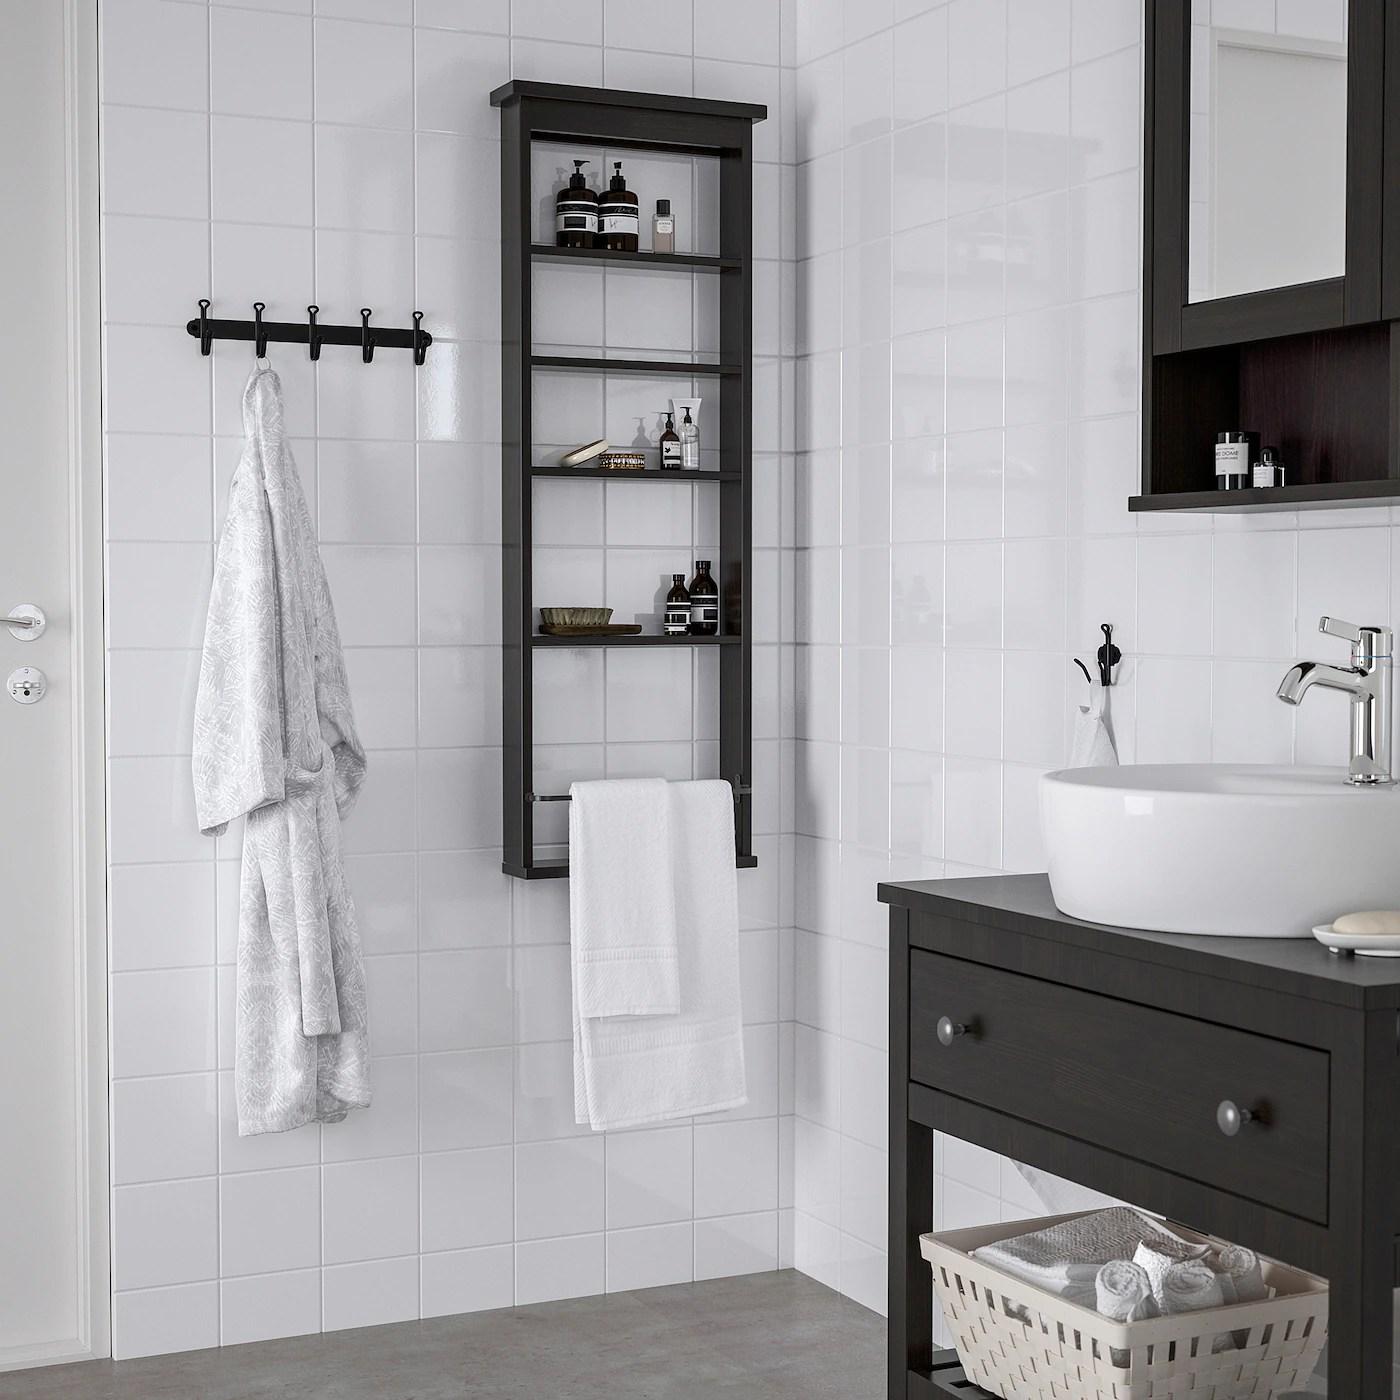 Hemnes Wall Shelf Black Brown 16 1 2x46 1 2 Ikea